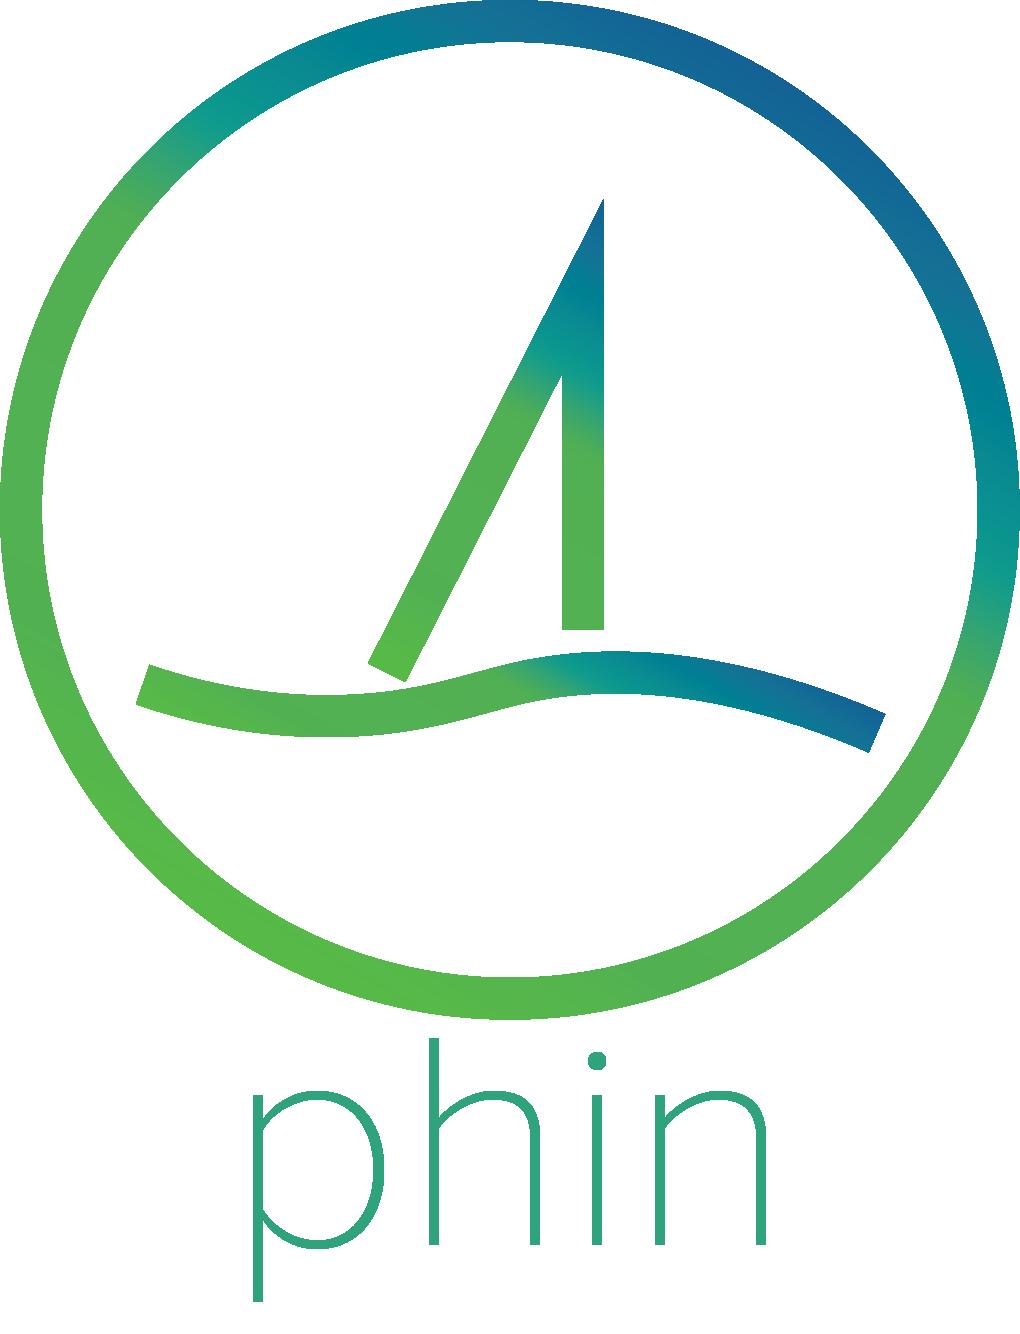 phin logo